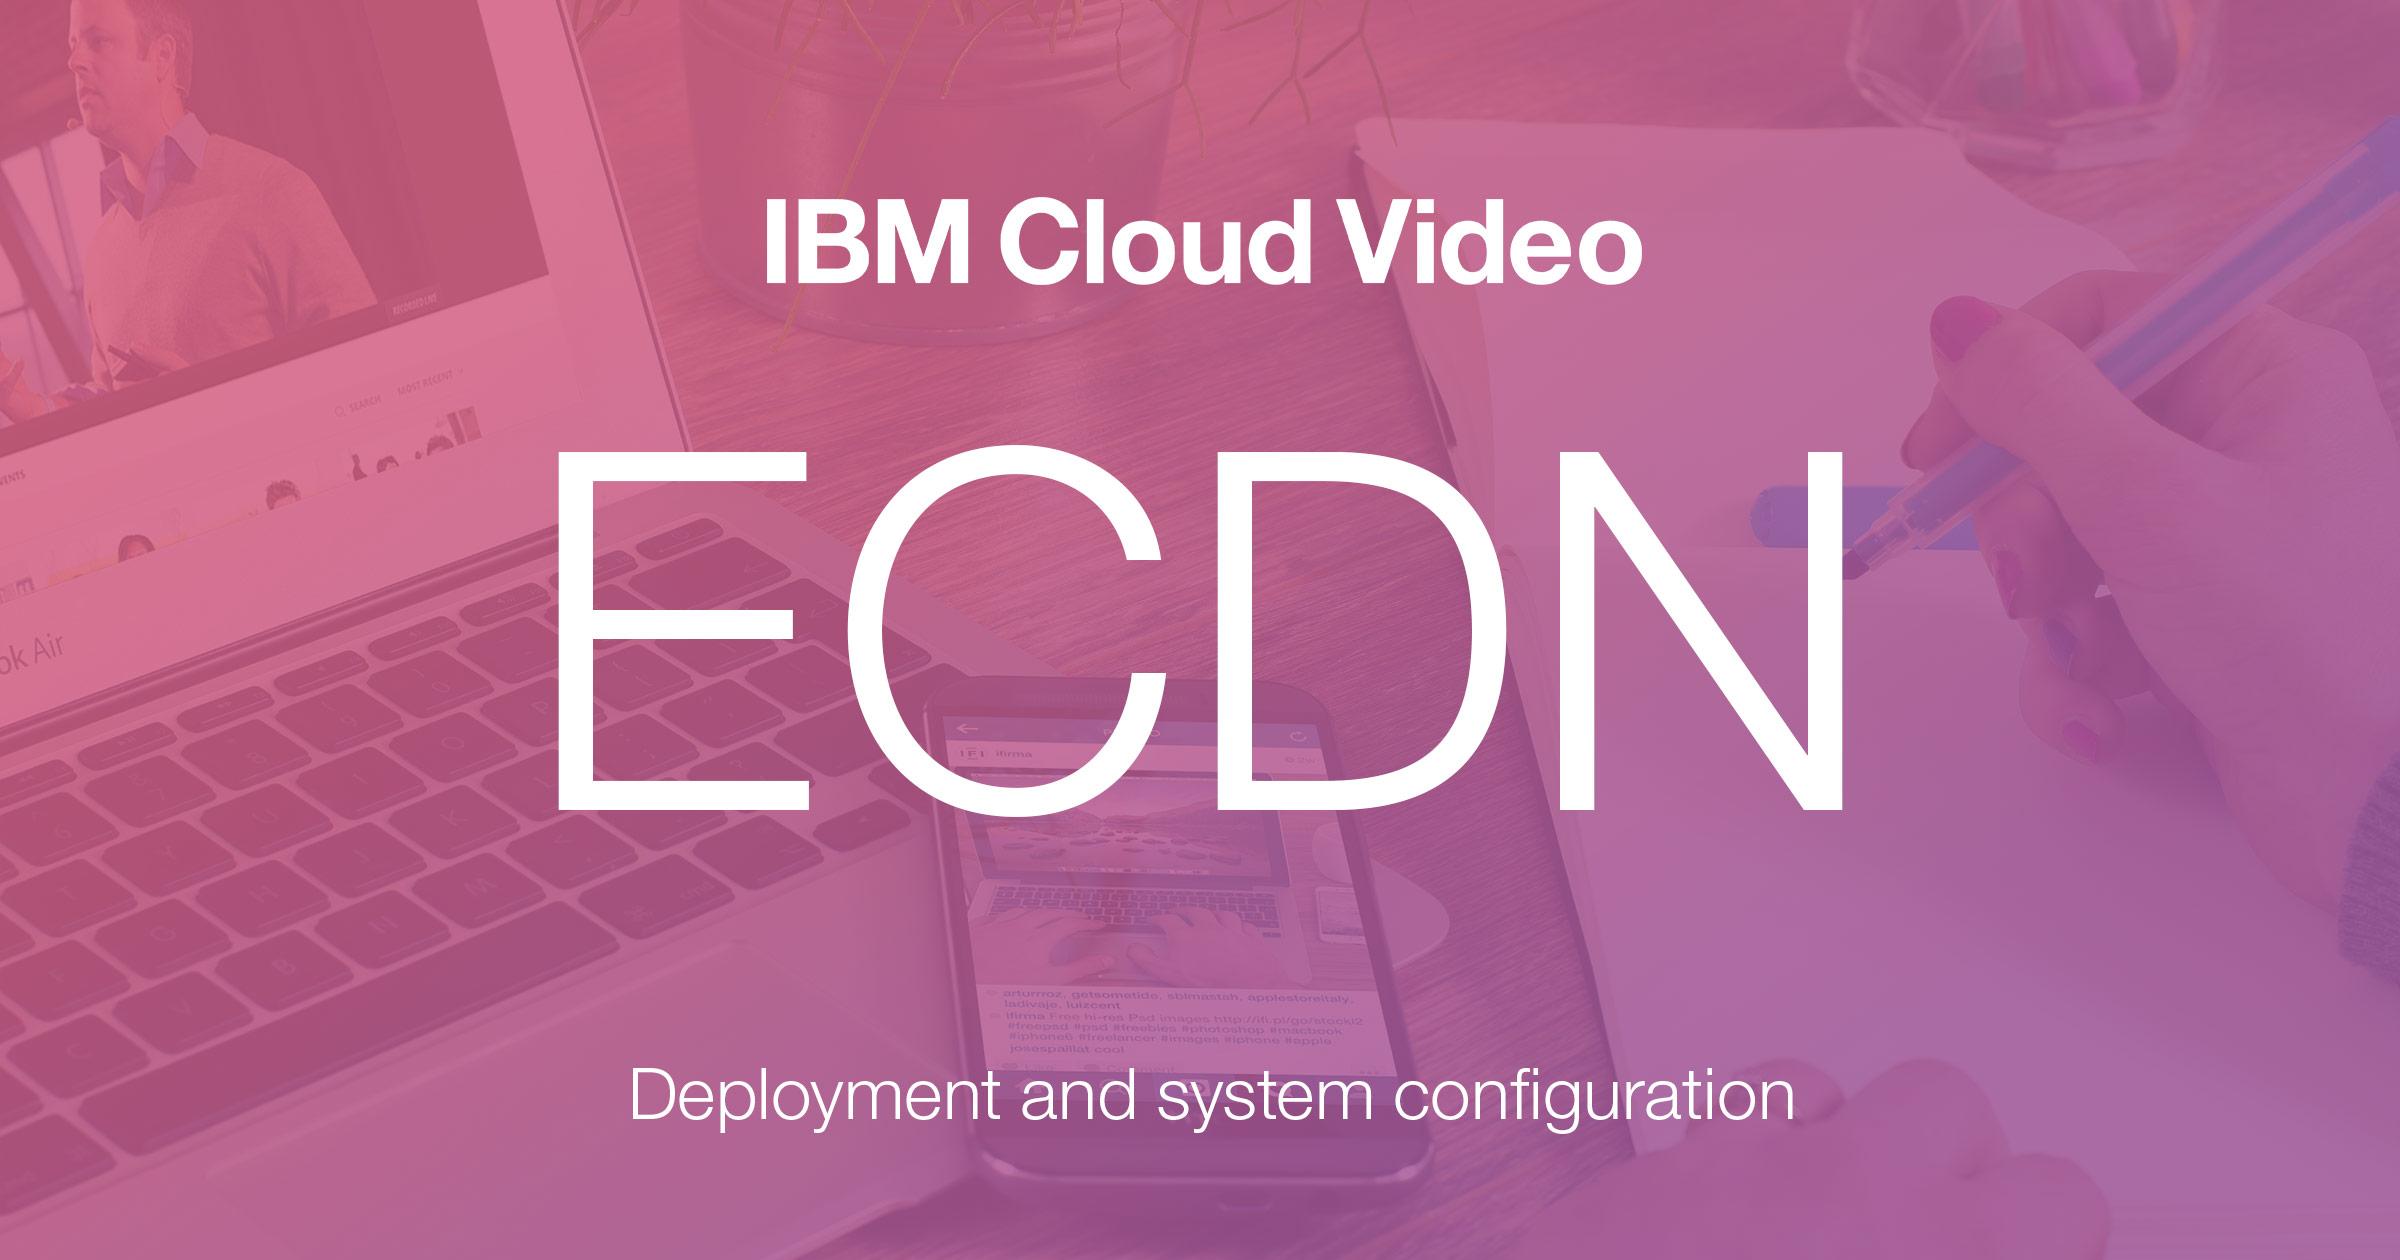 ECDN benefits, deployment & system configuration